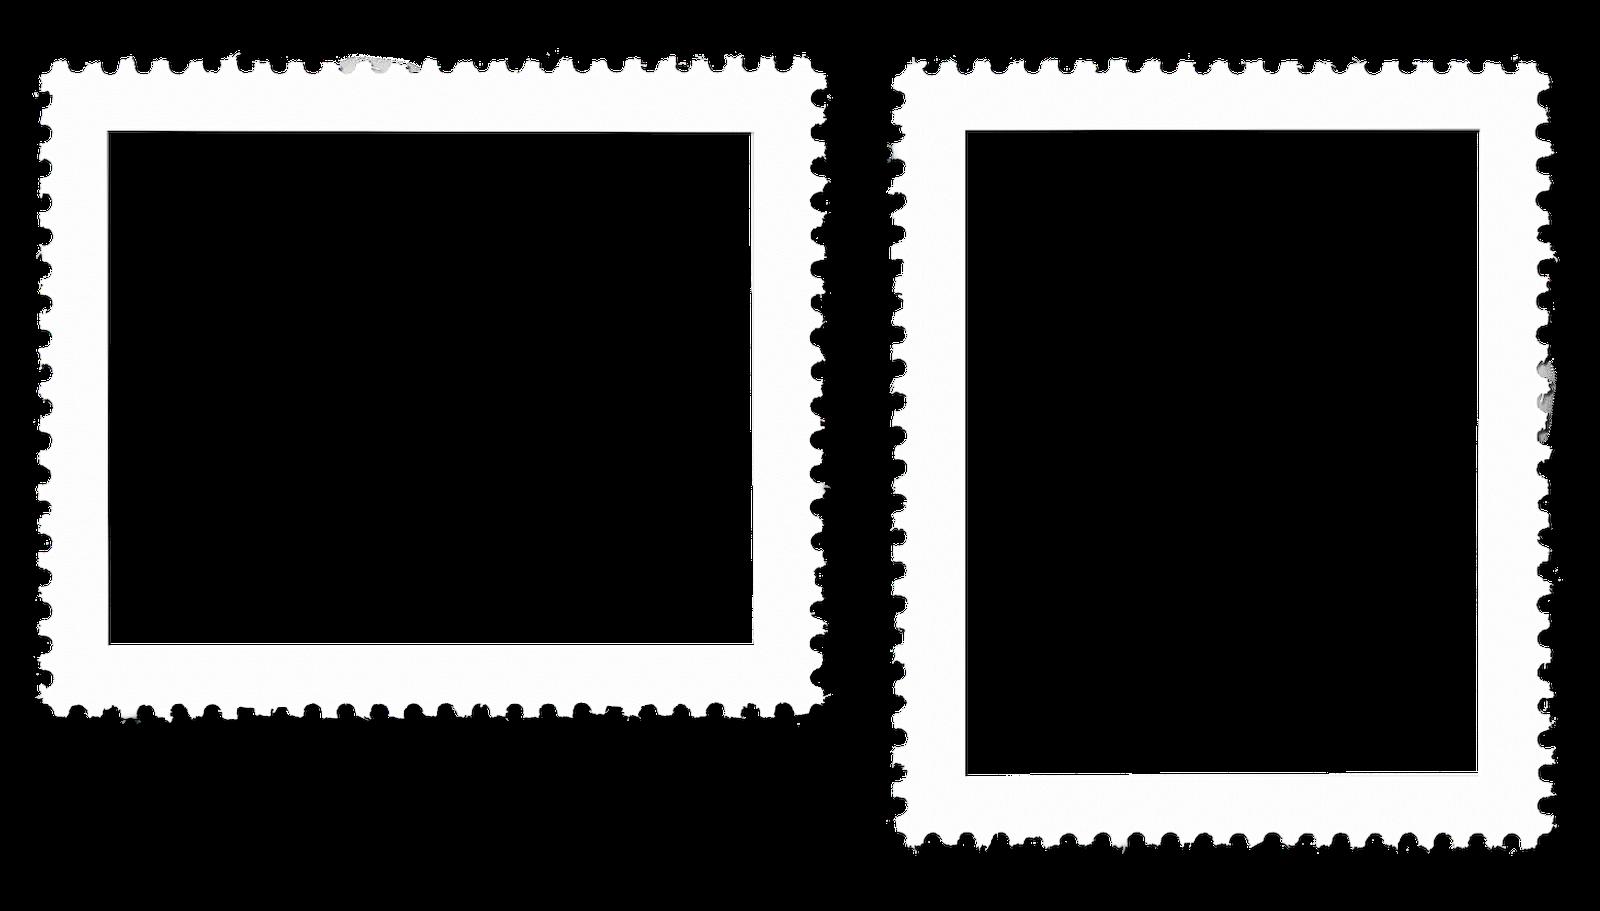 Postage Stamp Border Html Template Ebay   Wedding Photo